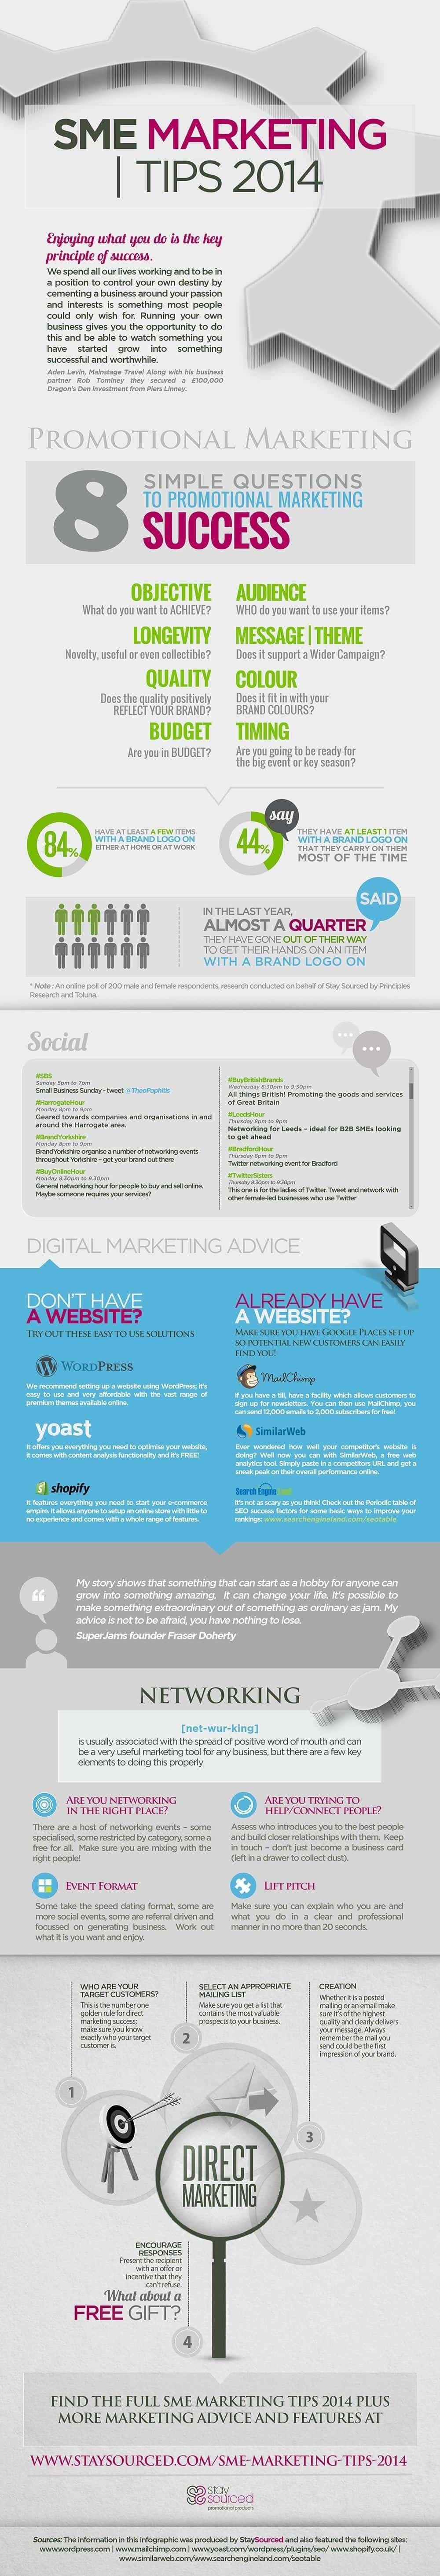 SME Marketing Tips